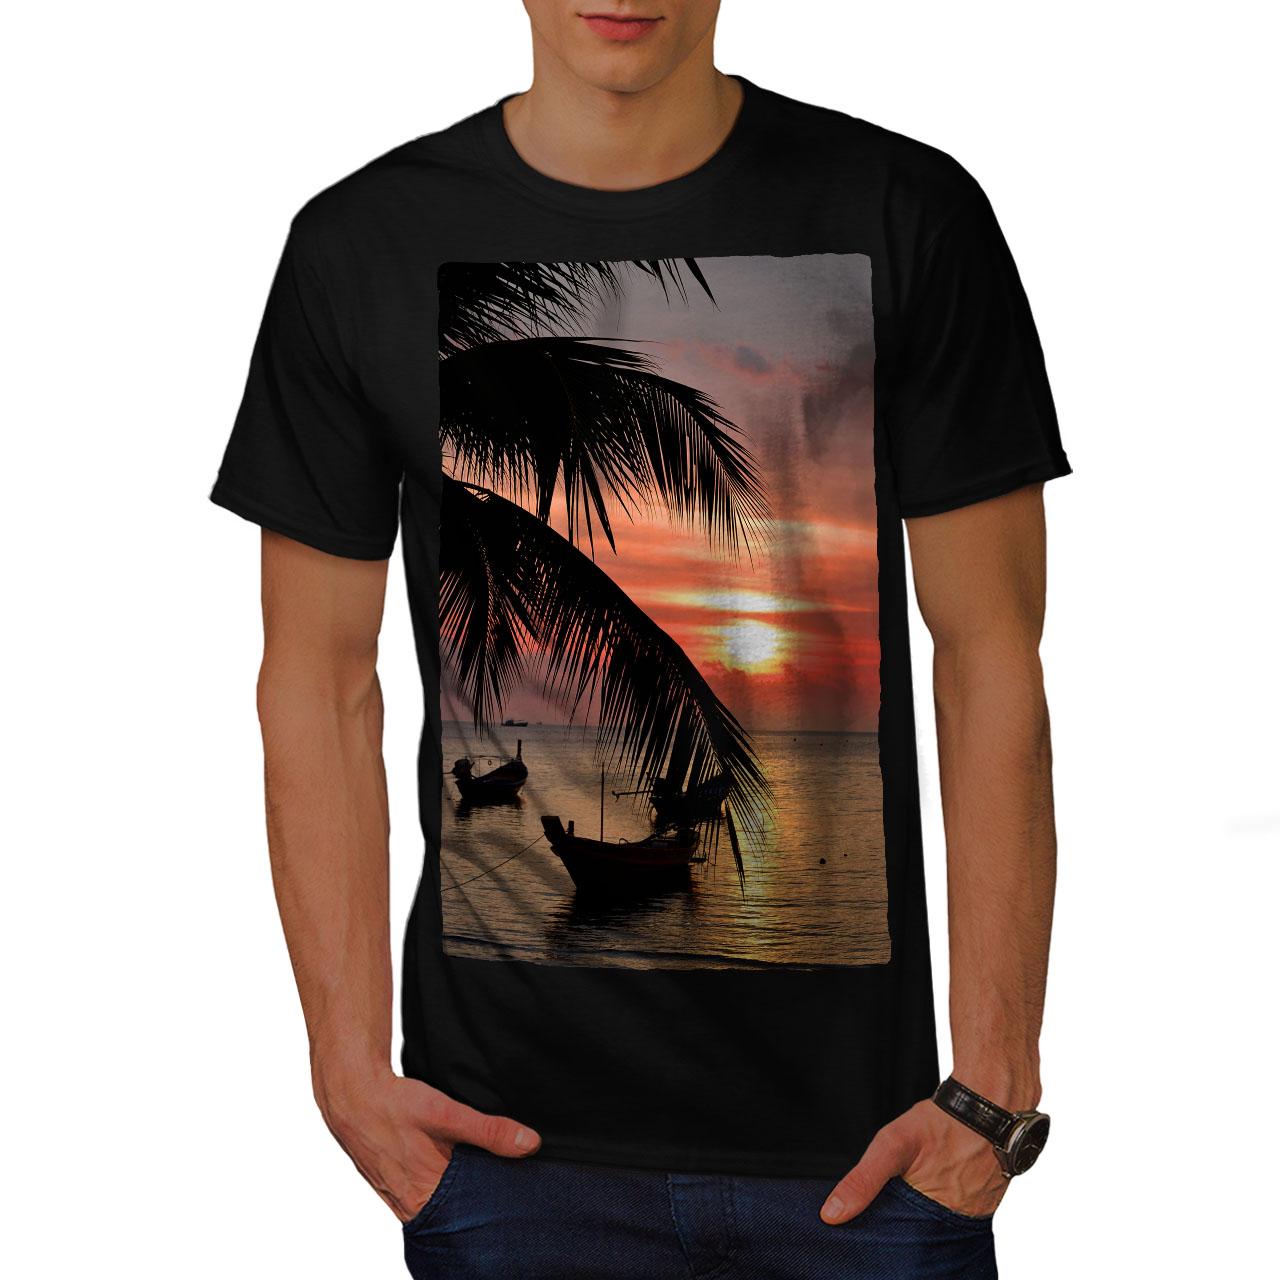 Wellcoda-Sunset-Palm-Tree-Mens-T-shirt-Ocean-Beach-Graphic-Design-Printed-Tee thumbnail 3